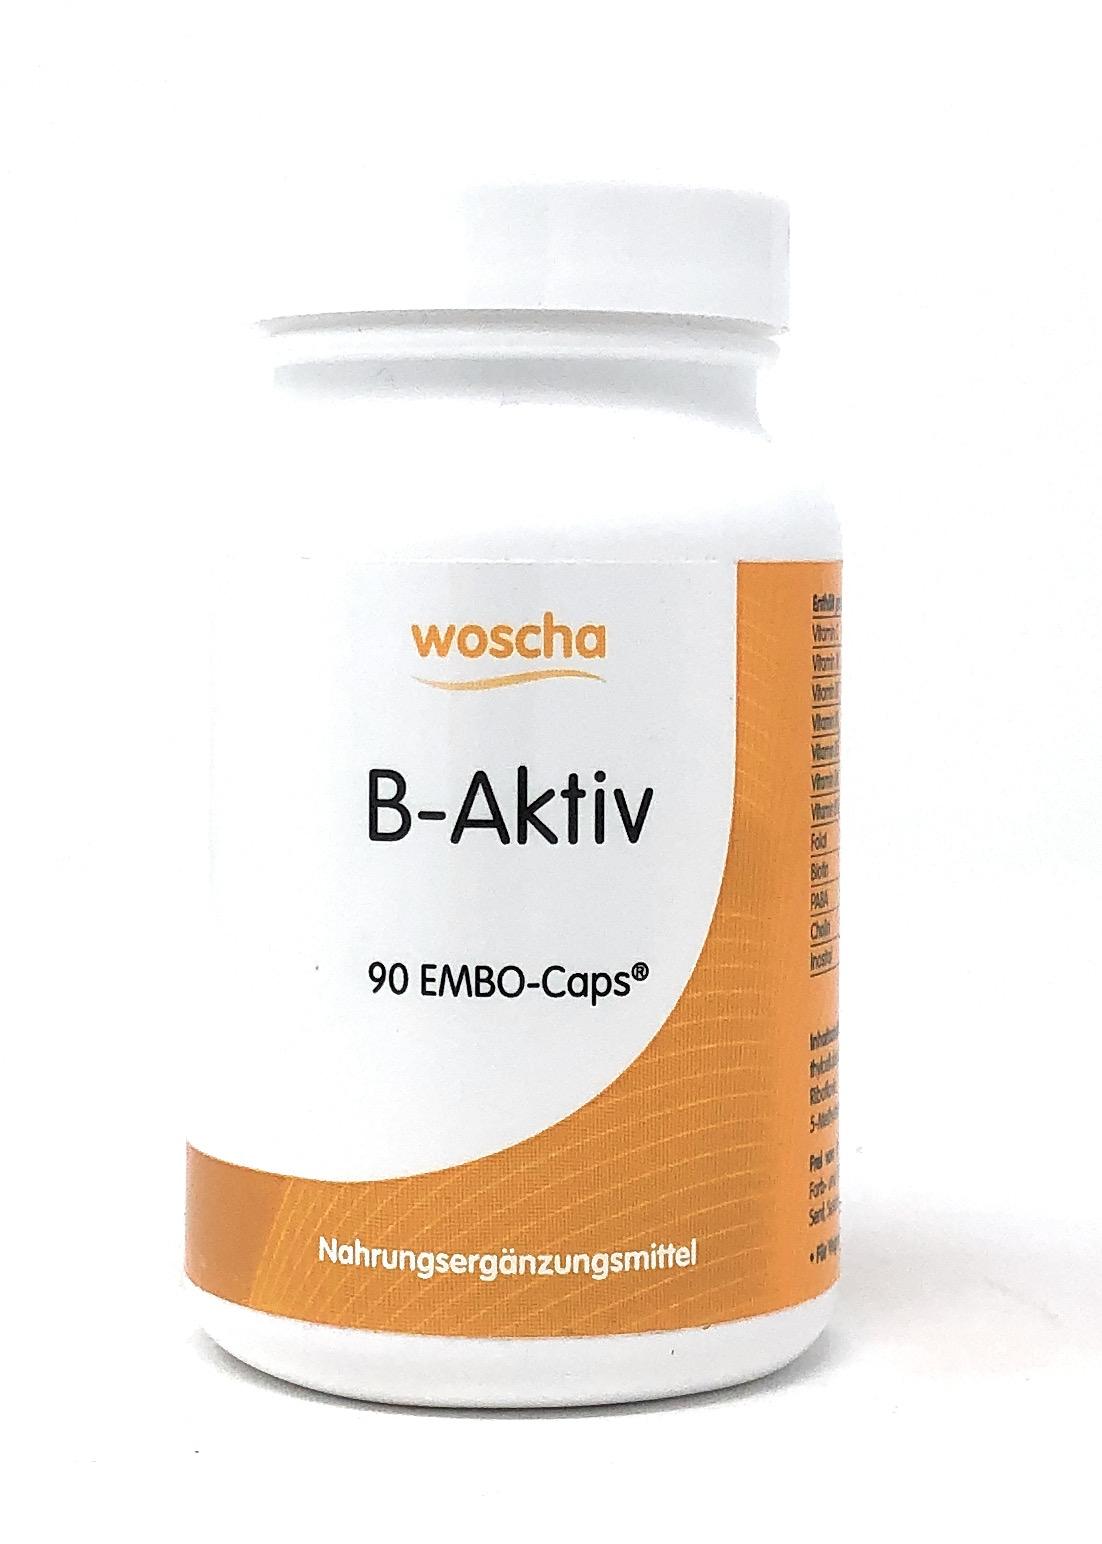 woscha B-Aktiv (aktiver B-Komplex mit Vitamin C) 90 Embo-Caps (74g)(vegan)